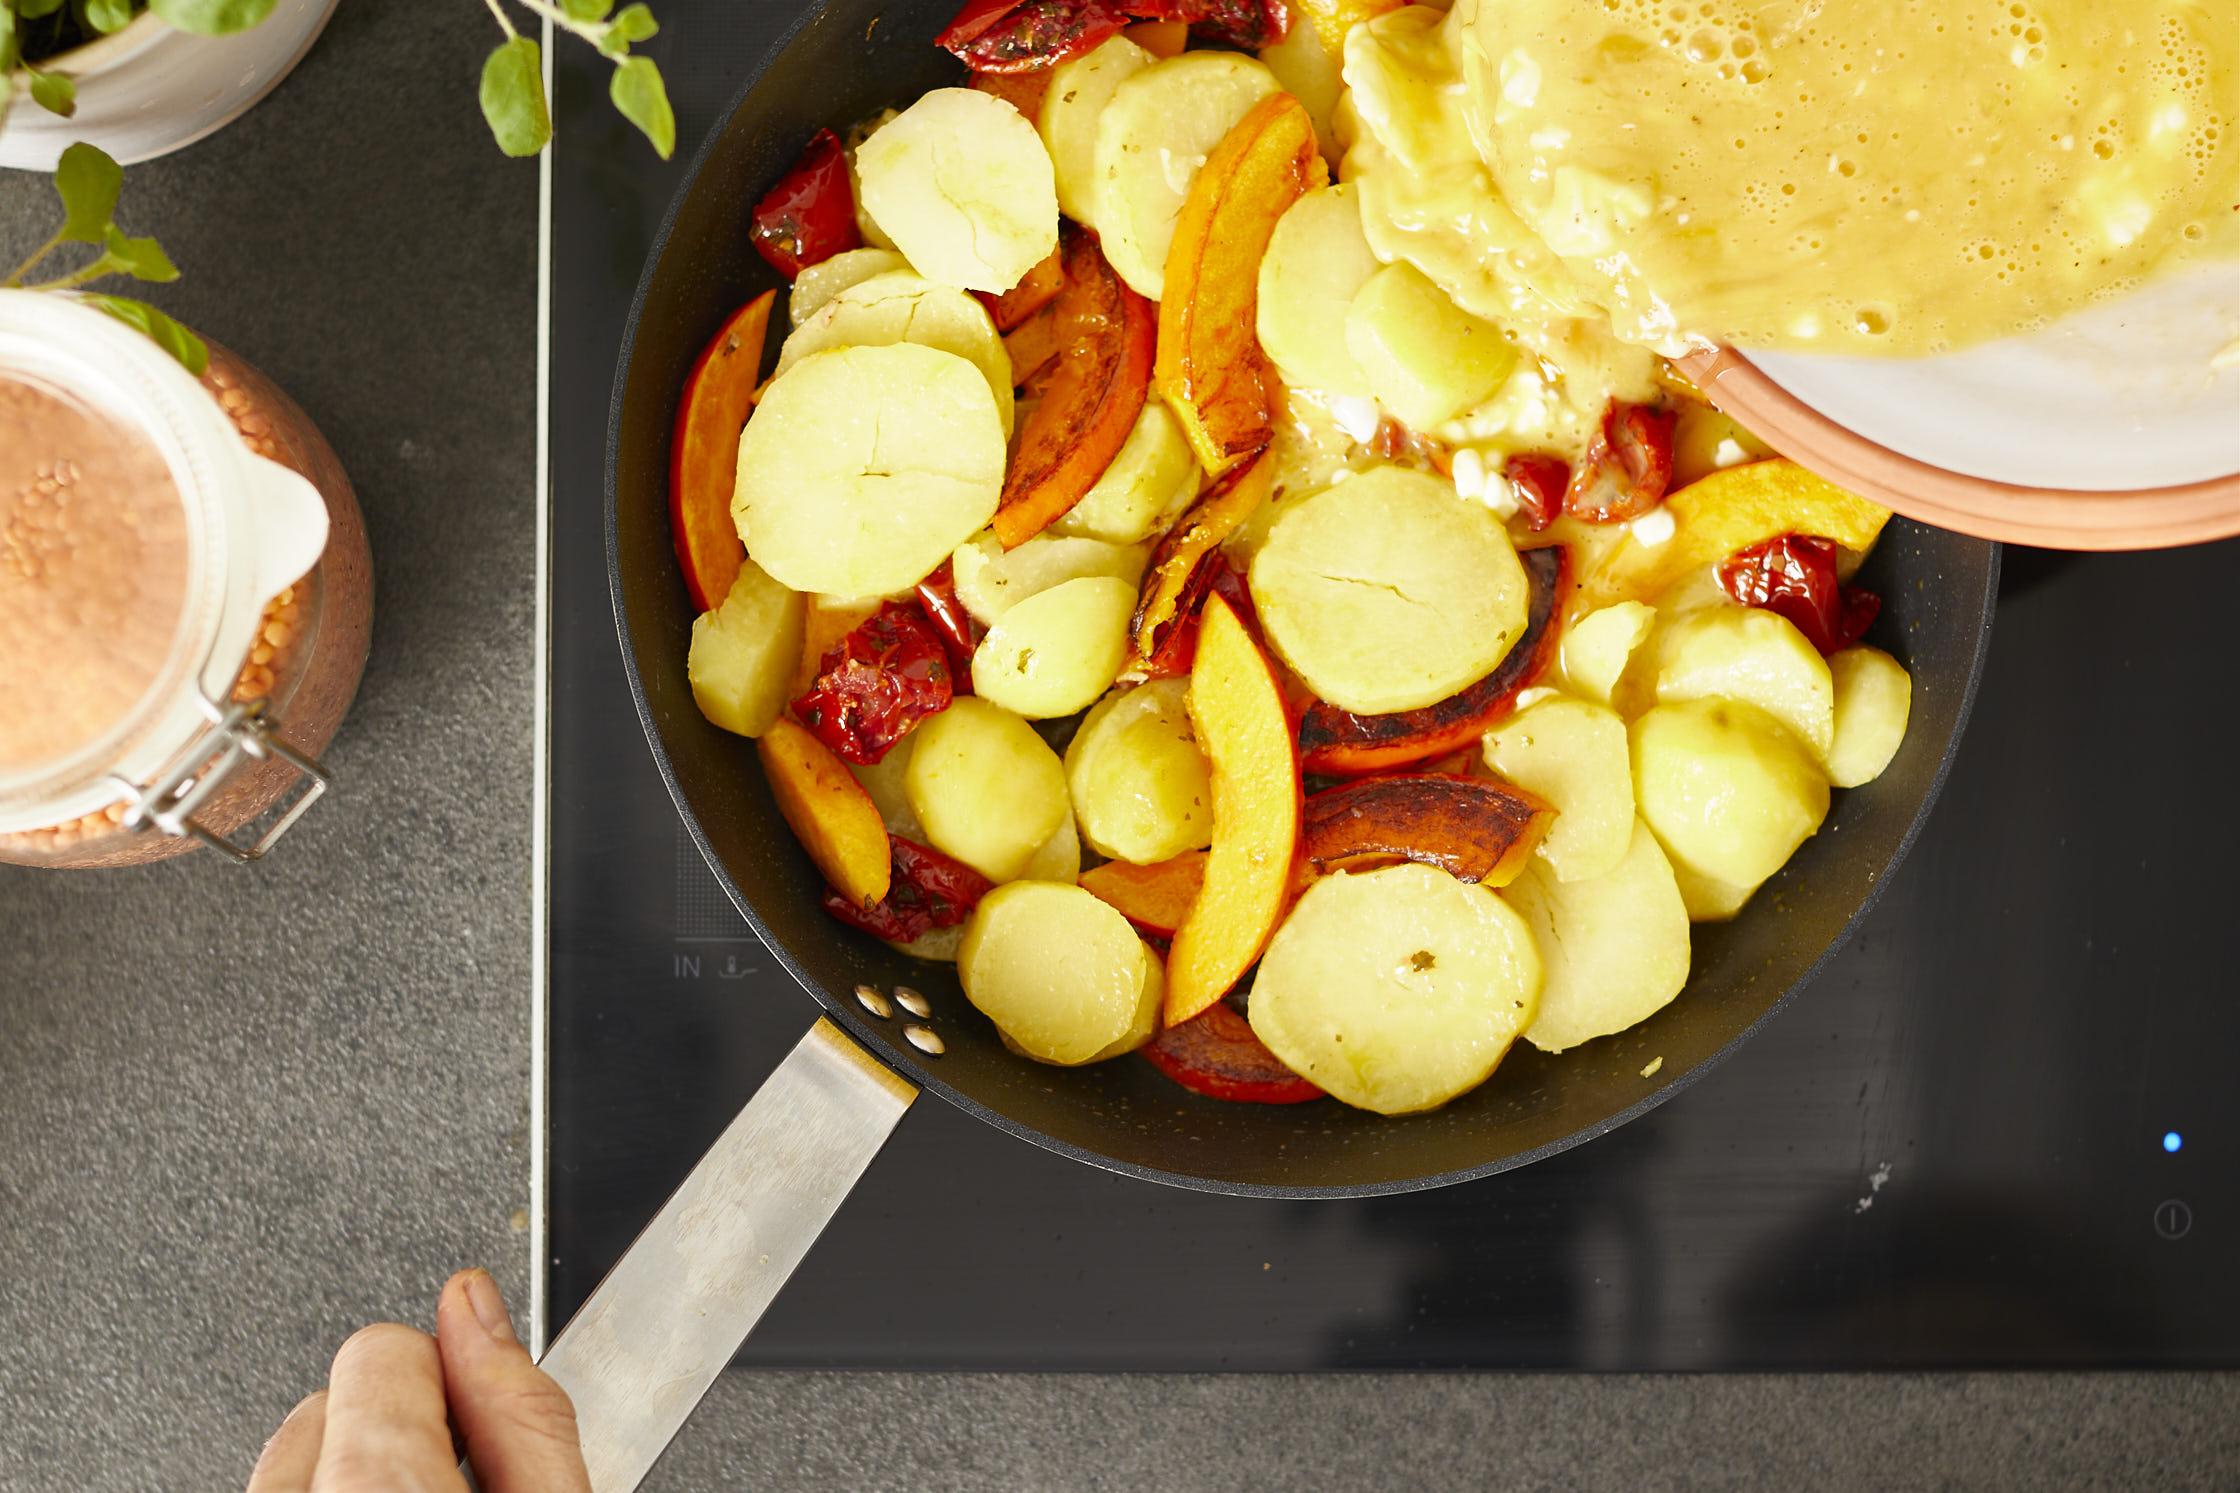 kartoffel-kürbis-frittata-rezept-einfach- 4